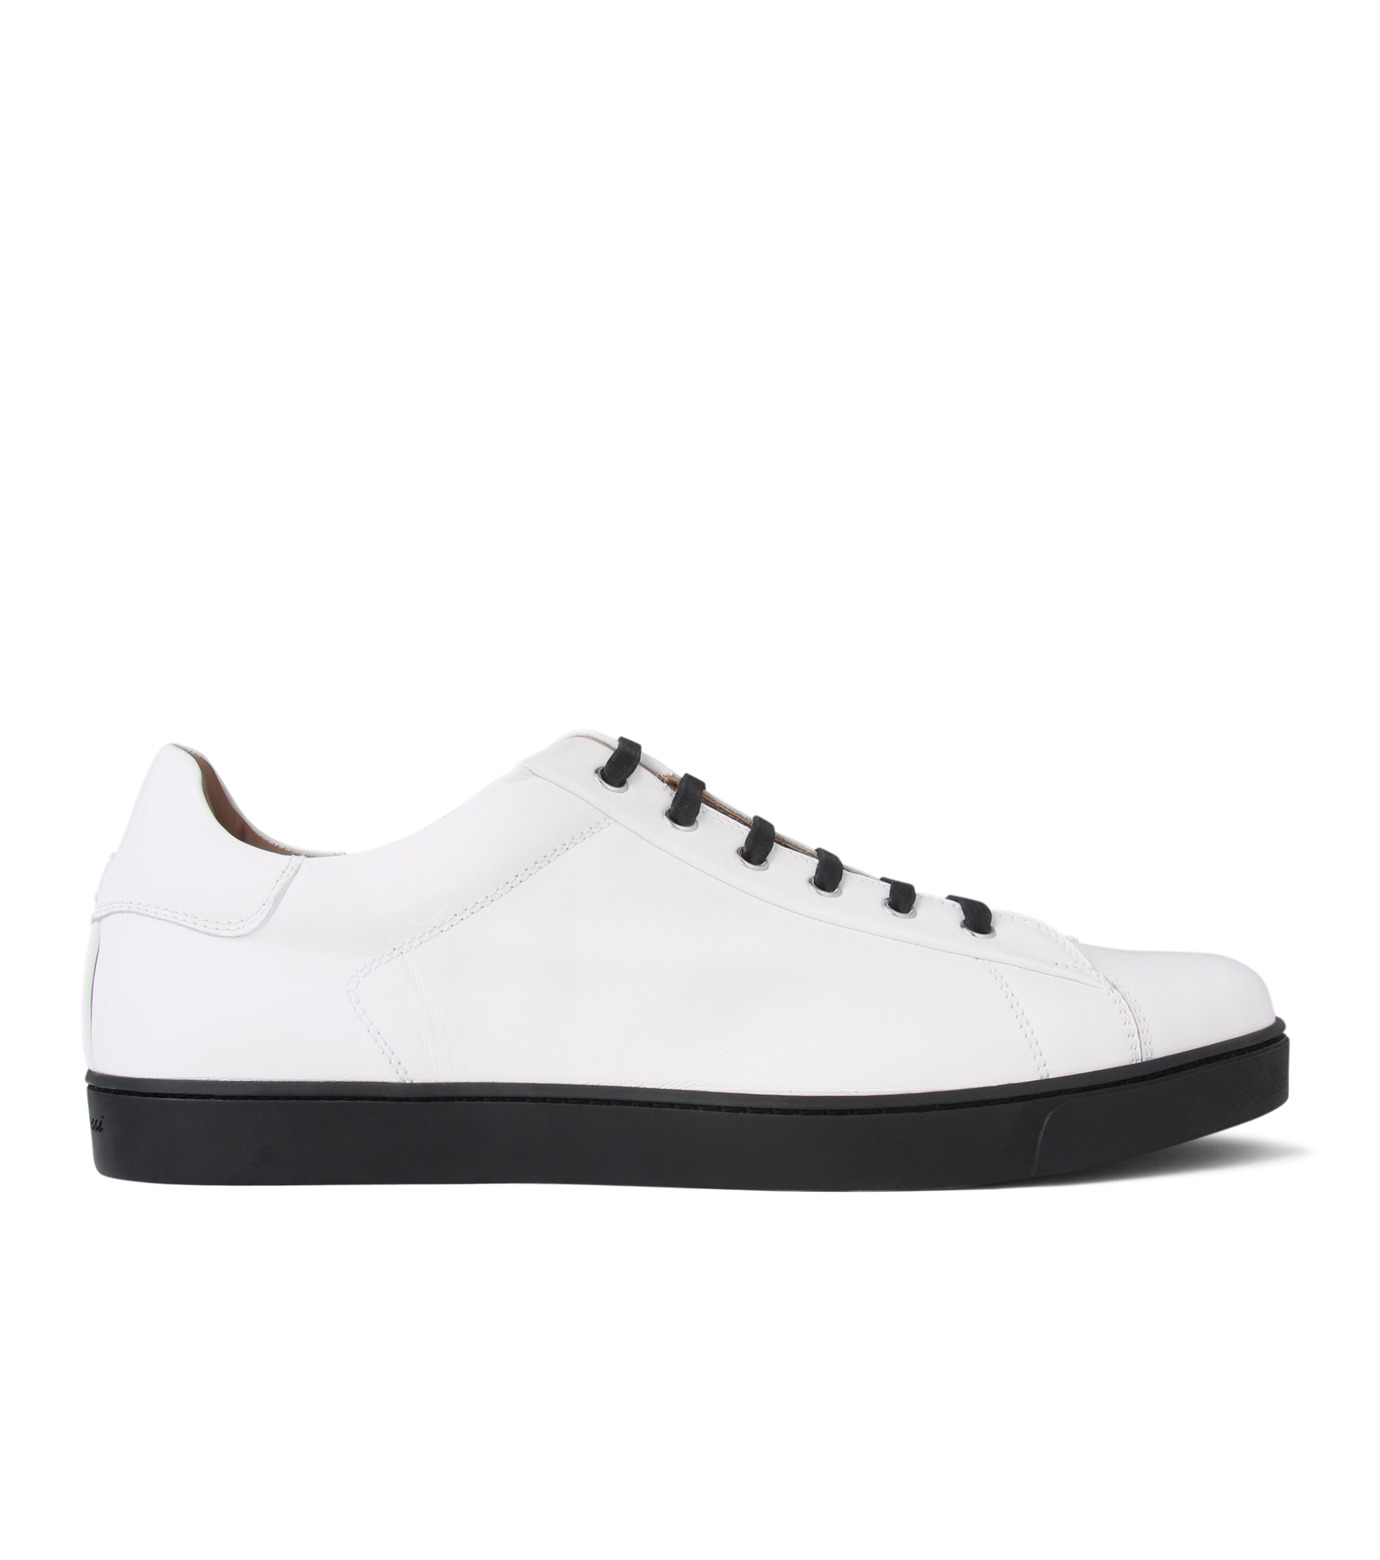 Gianvito Rossi(ジャンヴィト ロッシ)のLowcut Sneaker-WHITE(スニーカー/sneaker)-S26340-4 拡大詳細画像1